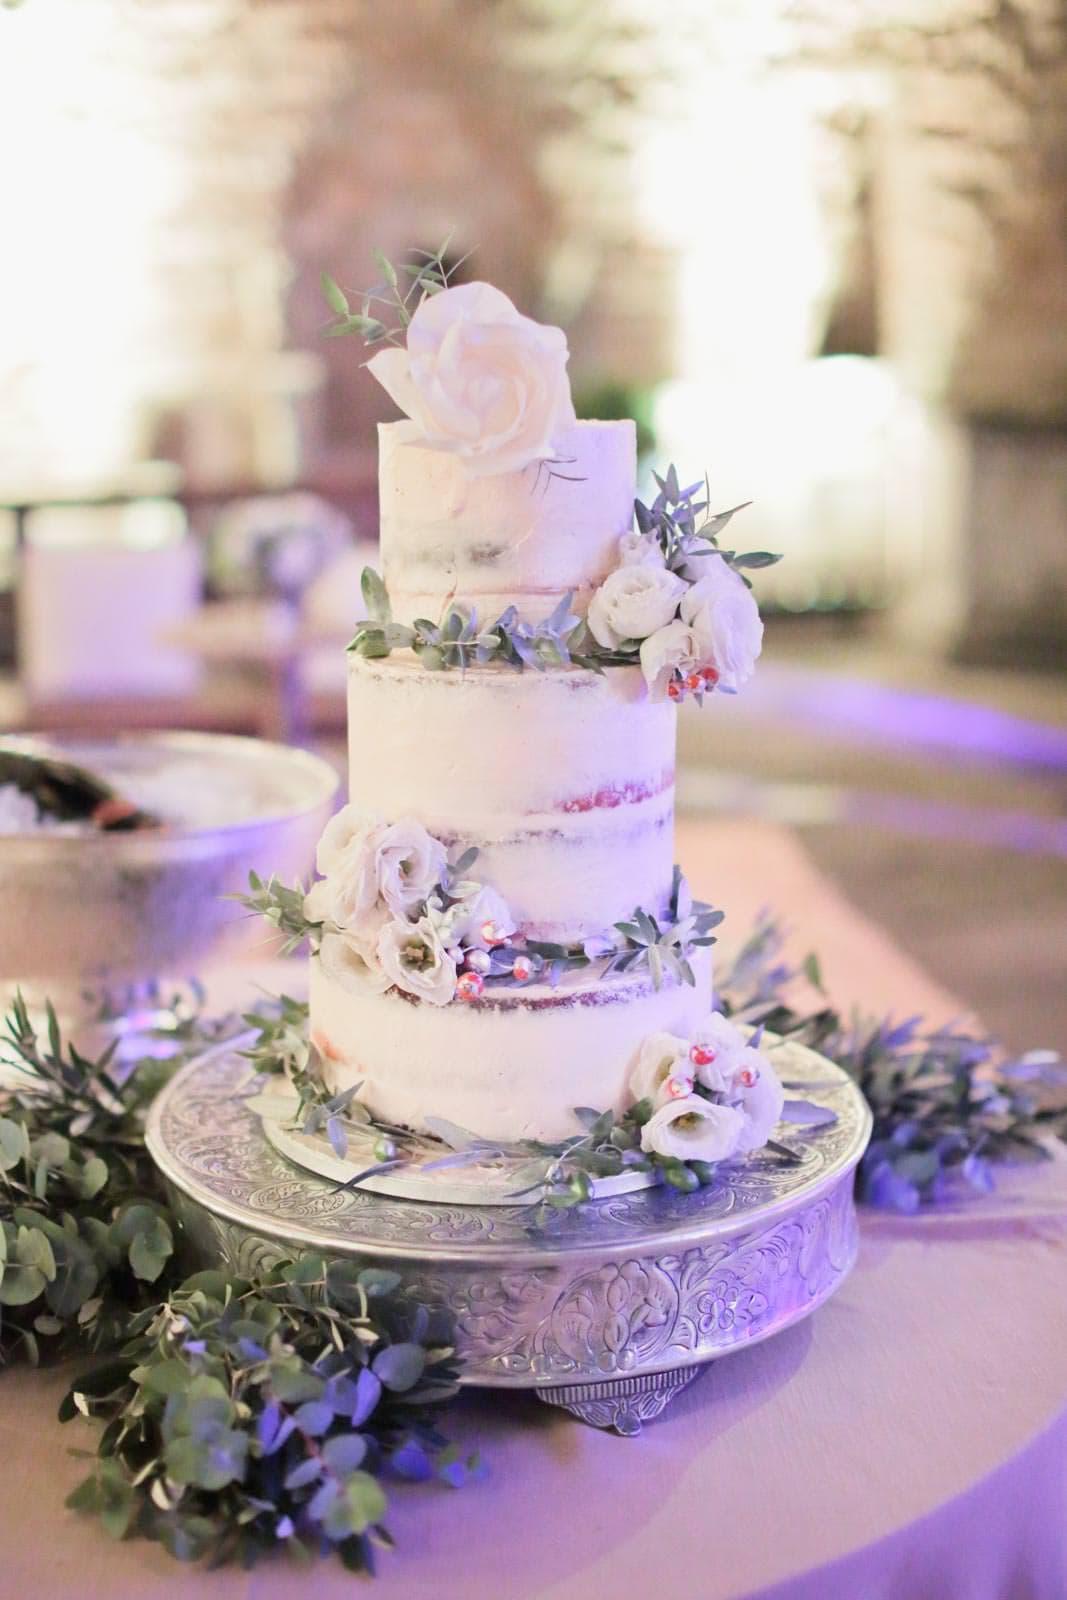 th cake